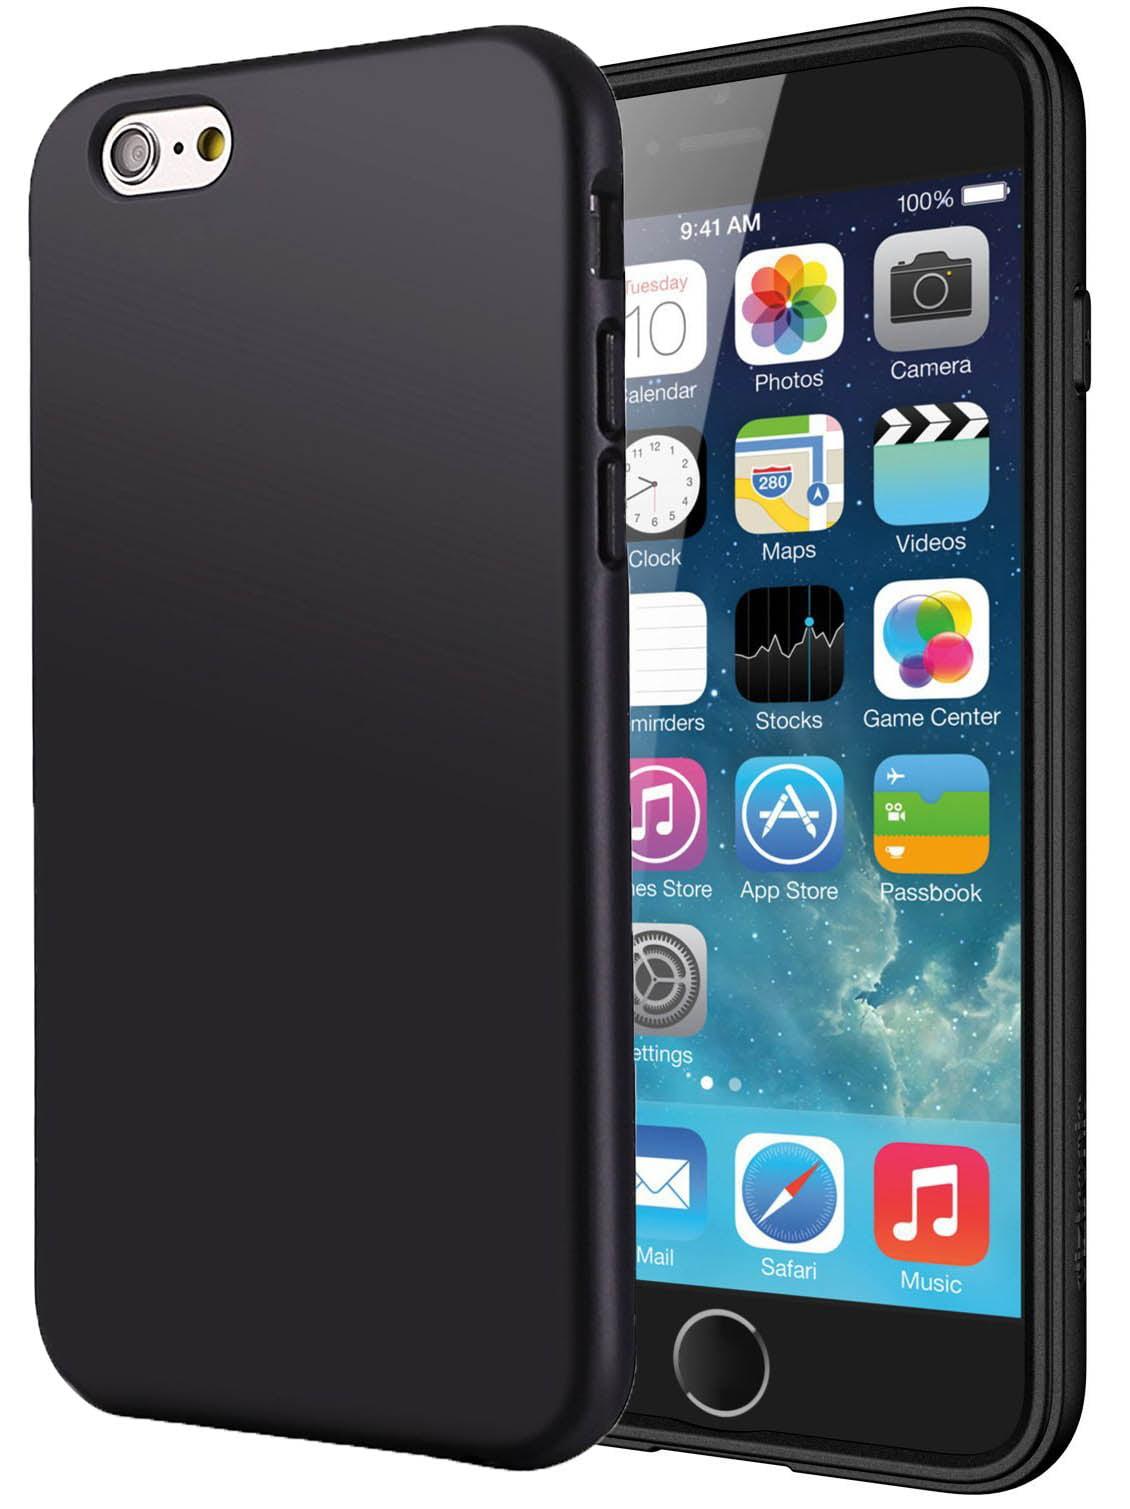 online store bcc3c 73ff1 iPHONE 6 PLUS CASE, MATTE BLACK FLEXIBLE TPU SKIN CASE SLIM COVER FOR APPLE  iPHONE 6 PLUS, 6s PLUS, 5.5